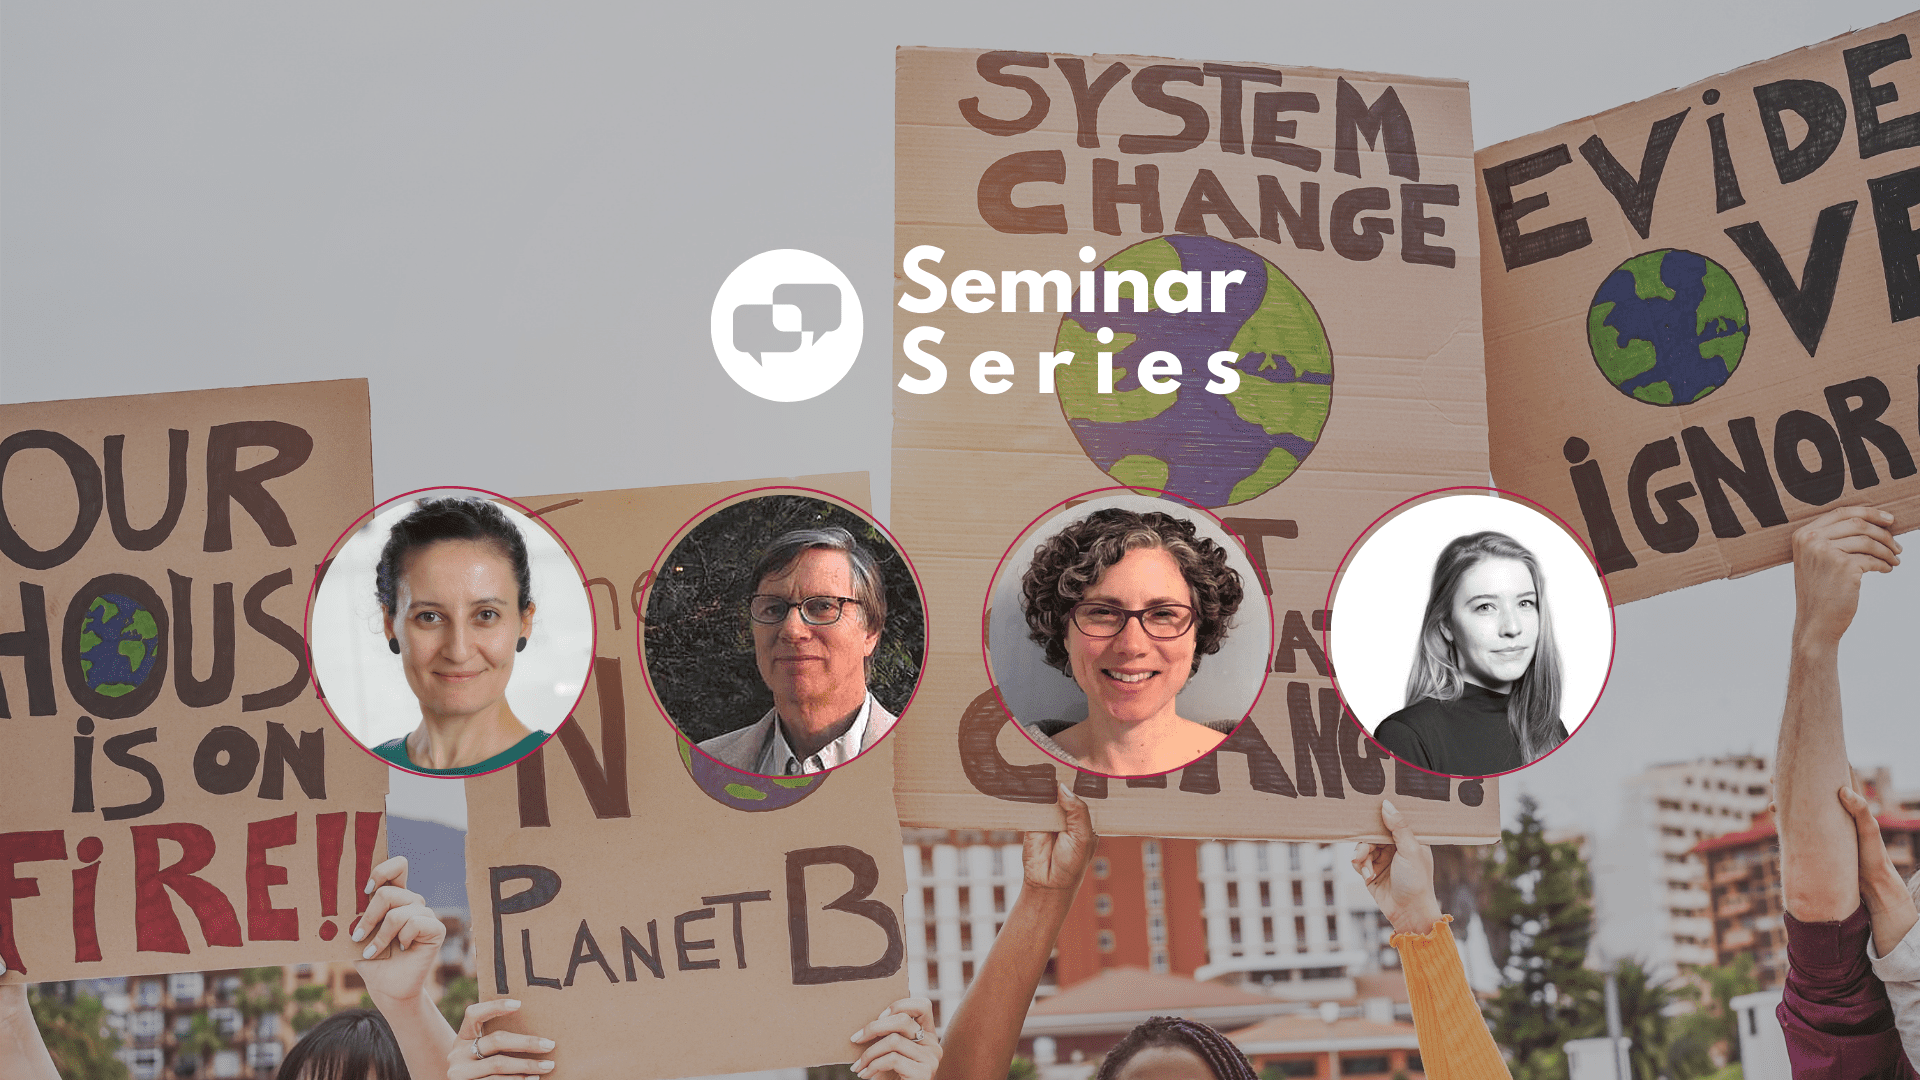 System Dynamics for Climate Change Mitigation